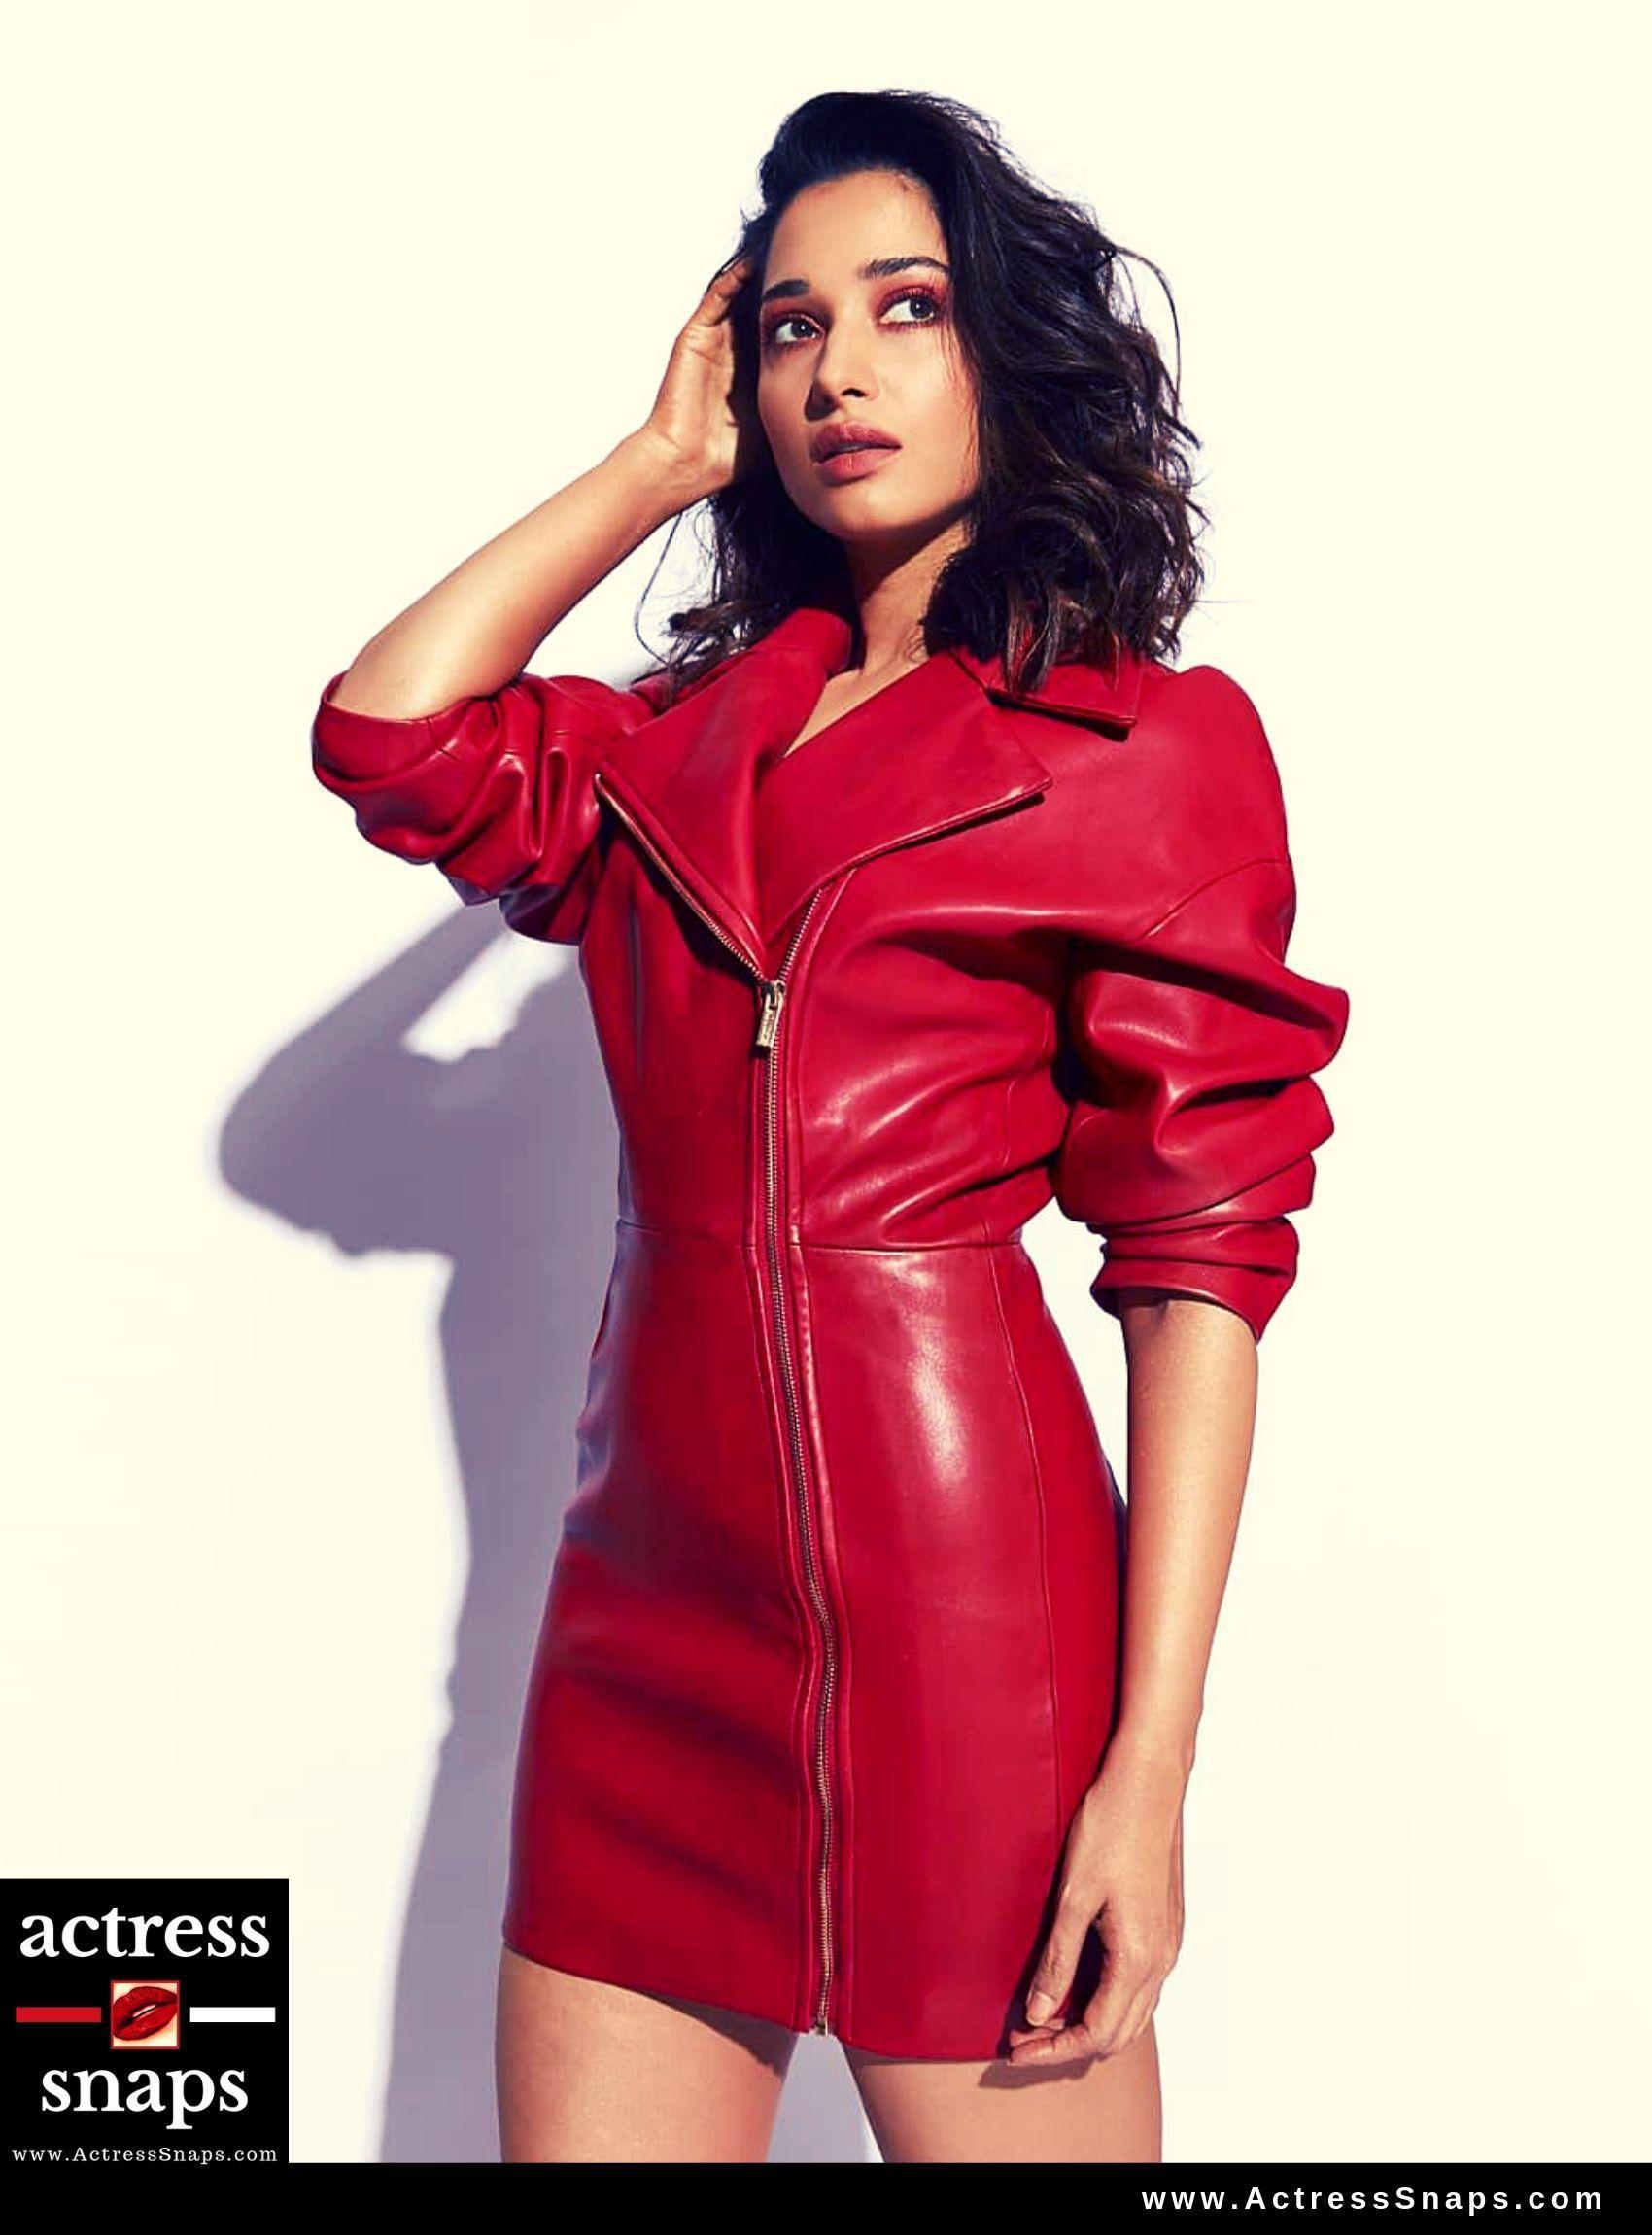 Tamannaah Bhatia at GQ Best Dressed Event - Sexy Actress Pictures | Hot Actress Pictures - ActressSnaps.com